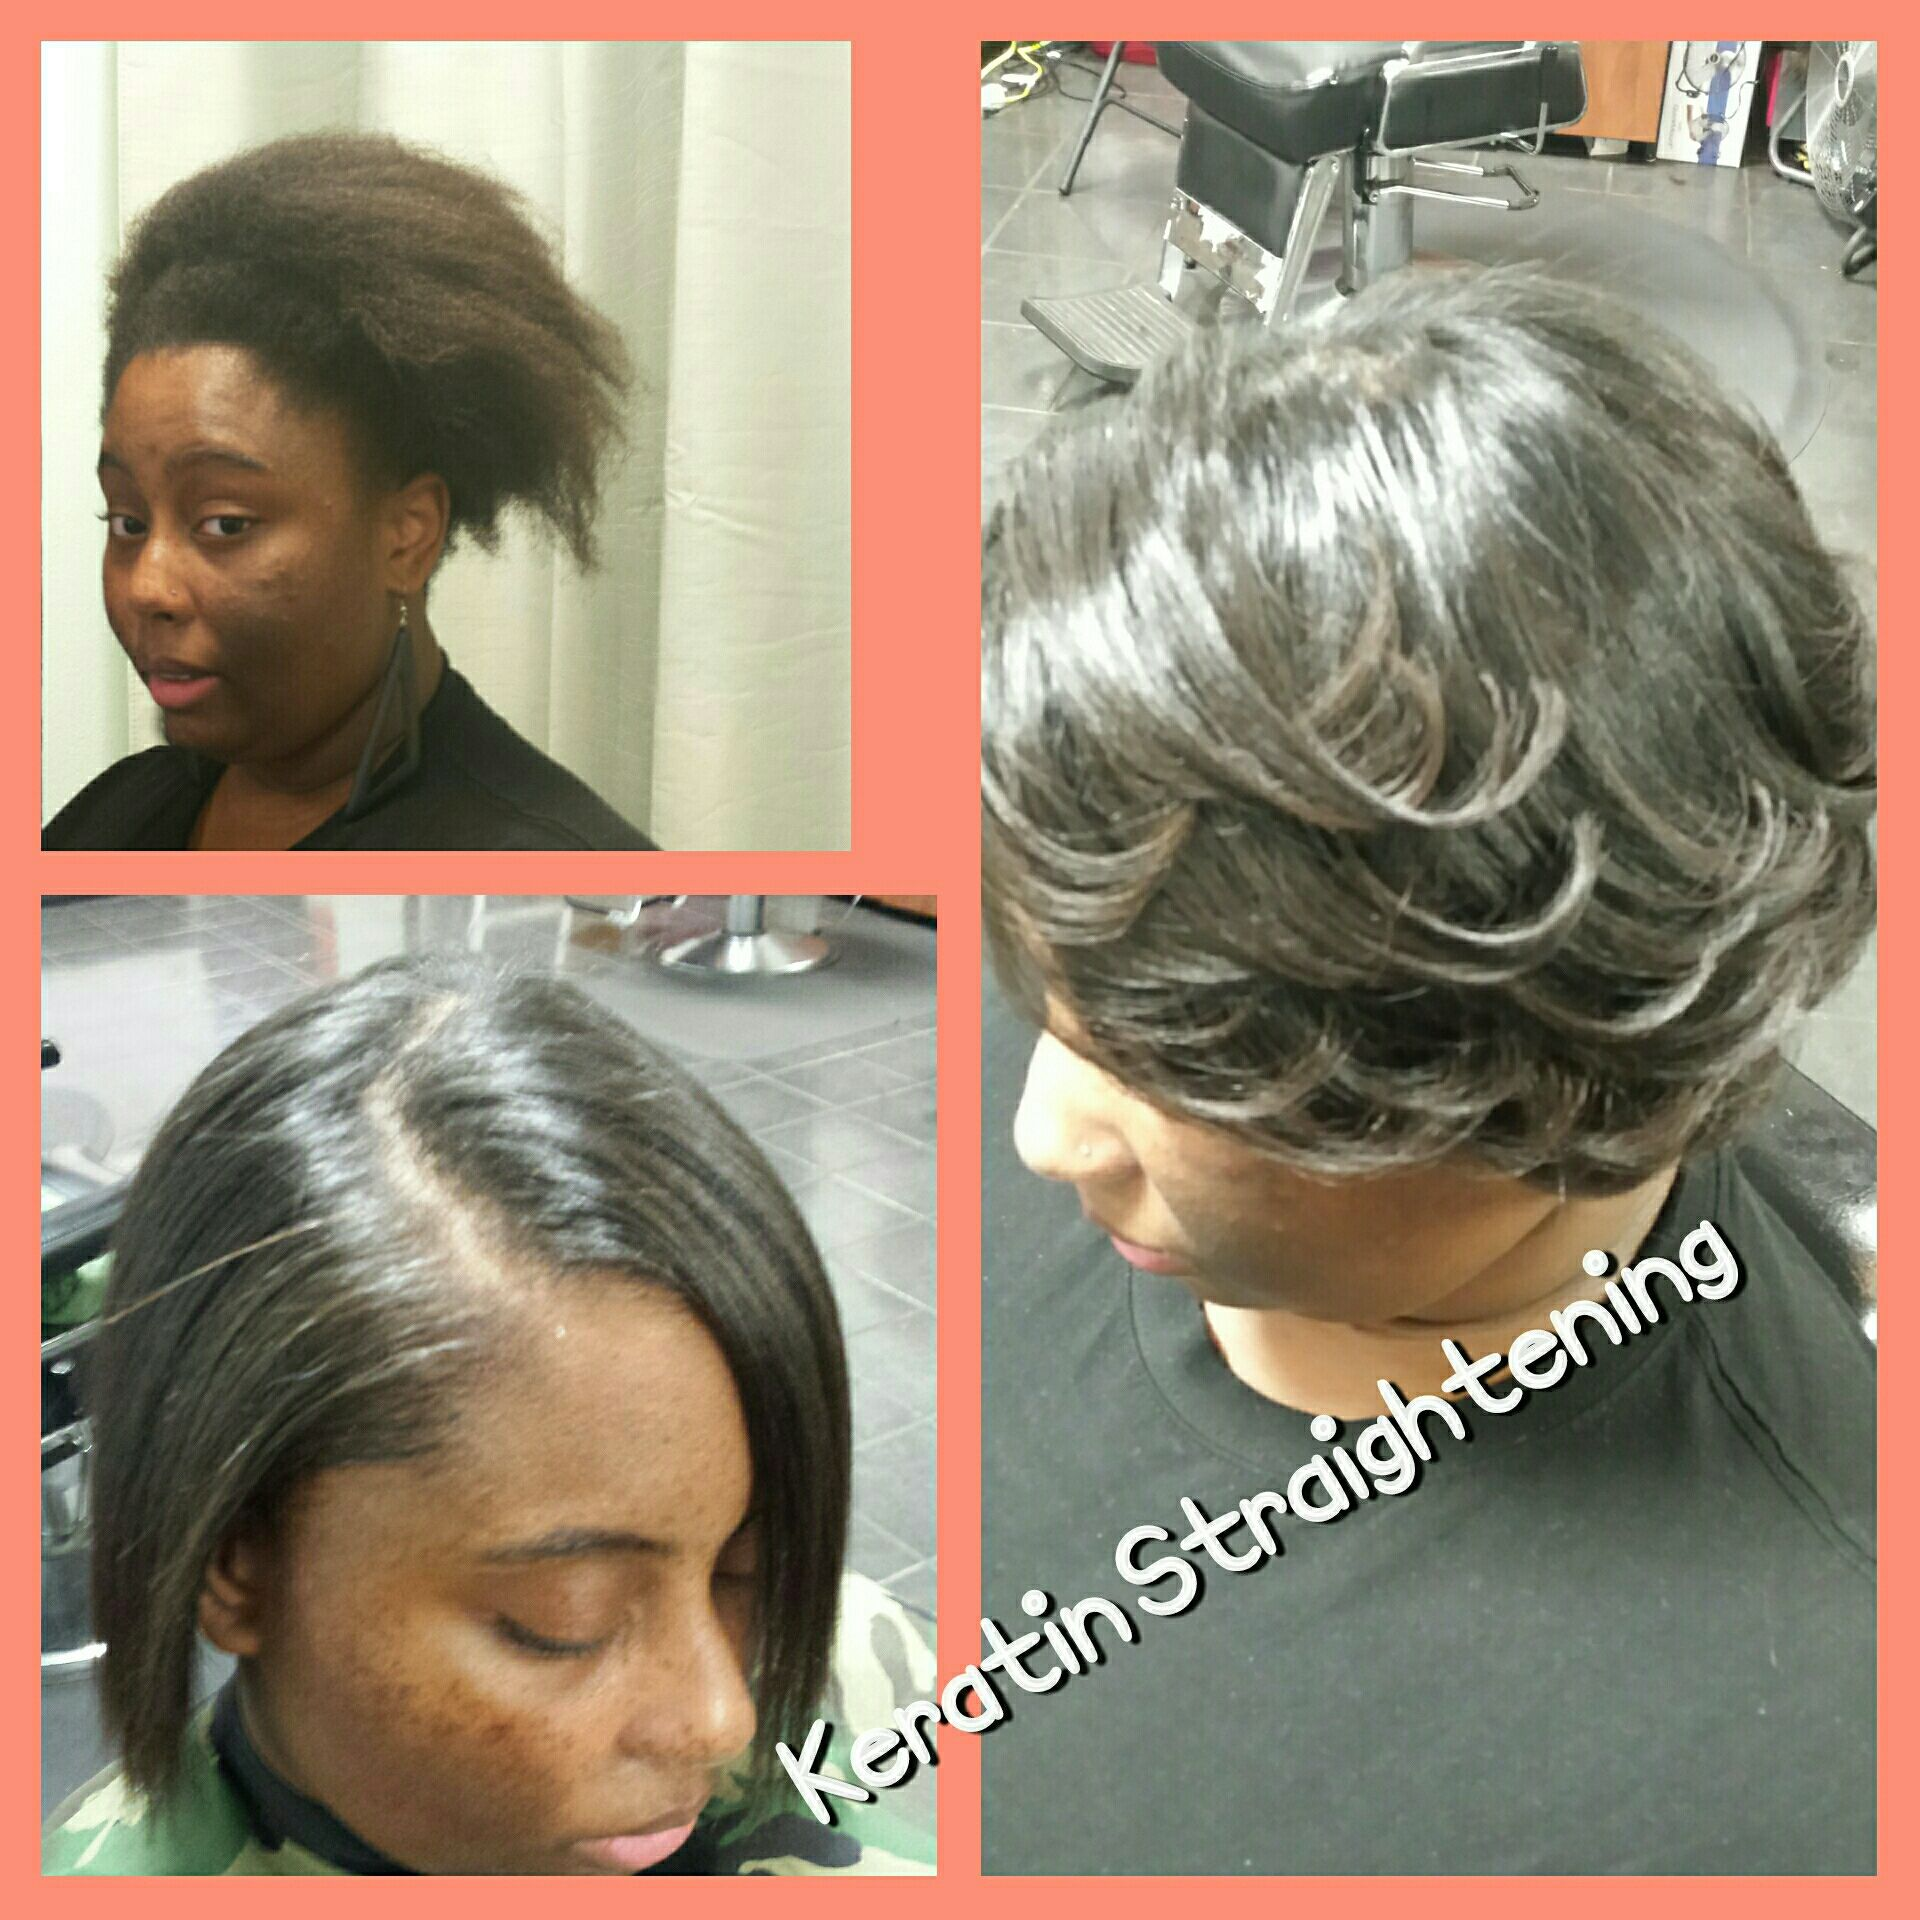 Keratin Protein Hair Straightening Treatments At Trendz By Tammy Hair Salon Houston Pearland Tx Hair Straightening Treatment Black Hair Salons Hair Protein